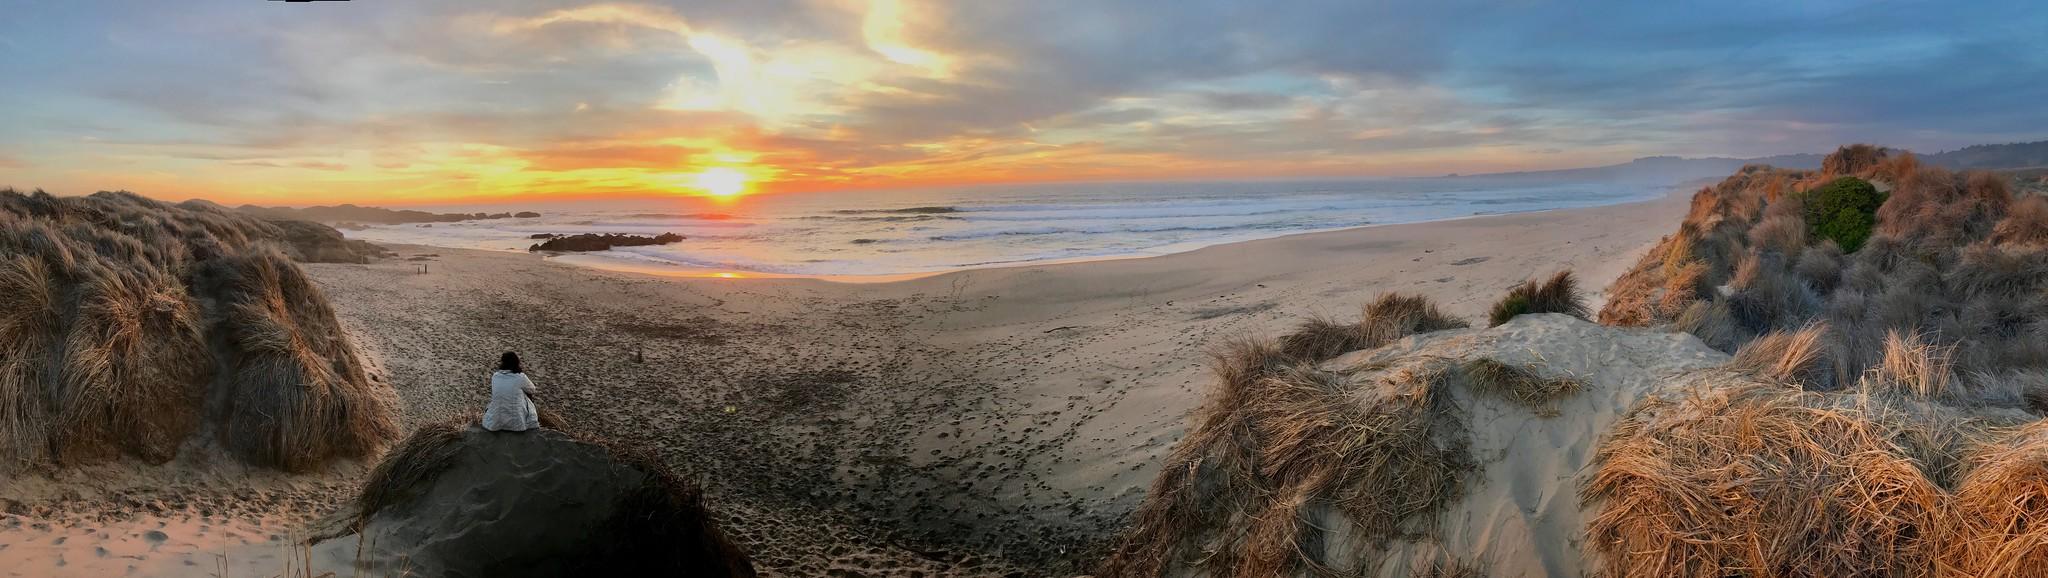 Costanoa Sunset Beach Hike